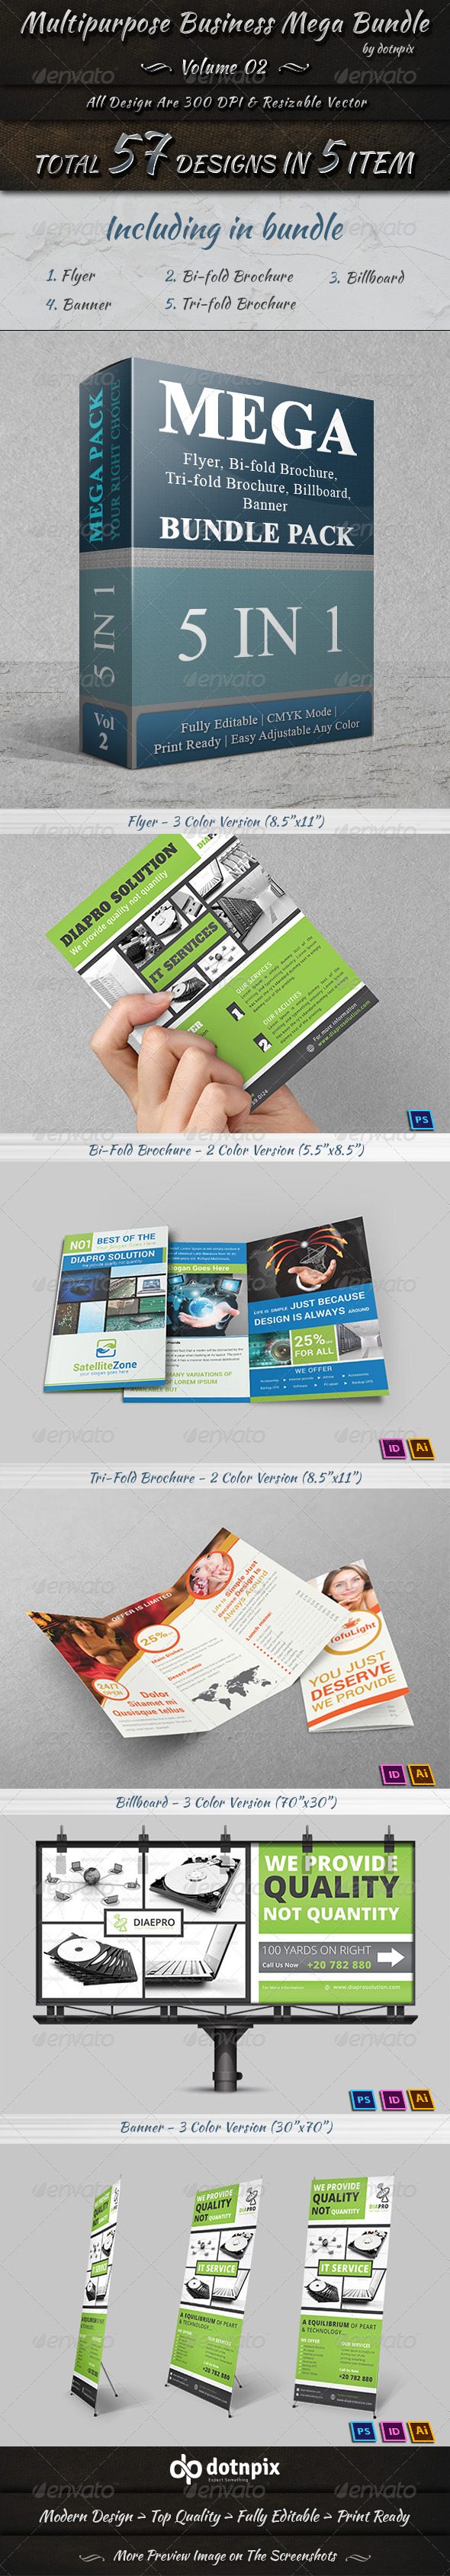 GraphicRiver Multipurpose Business Mega Bundle Volume 2 7689175